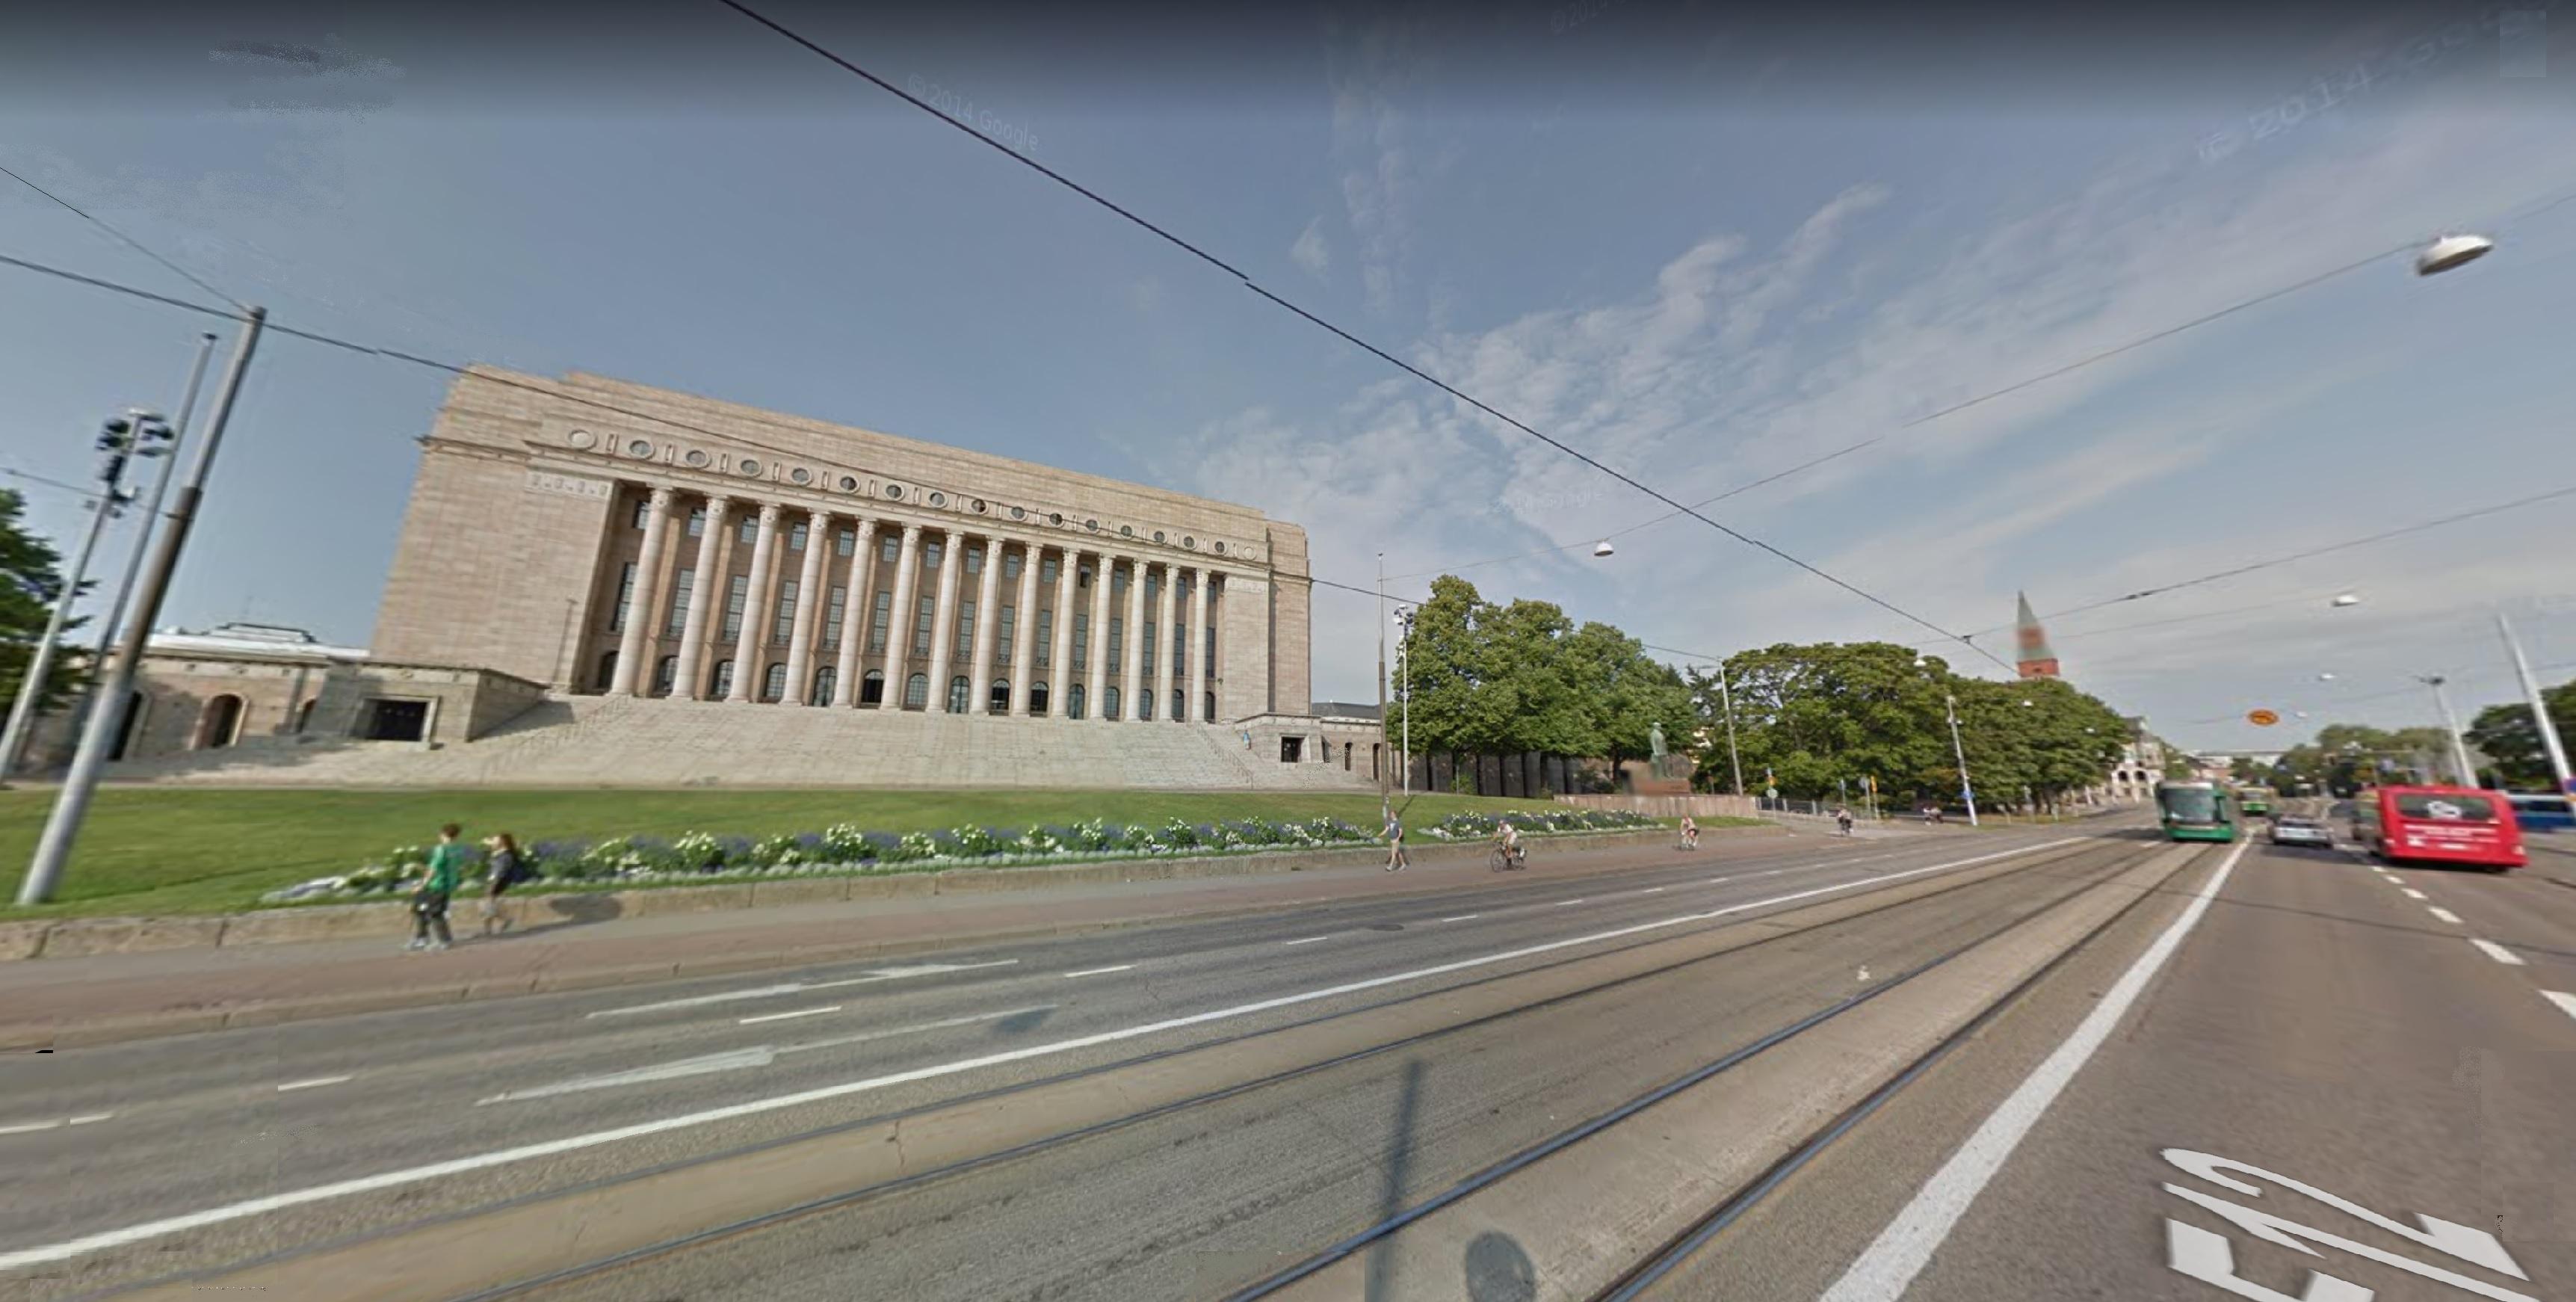 2021-05-01 Finland Parliament Building